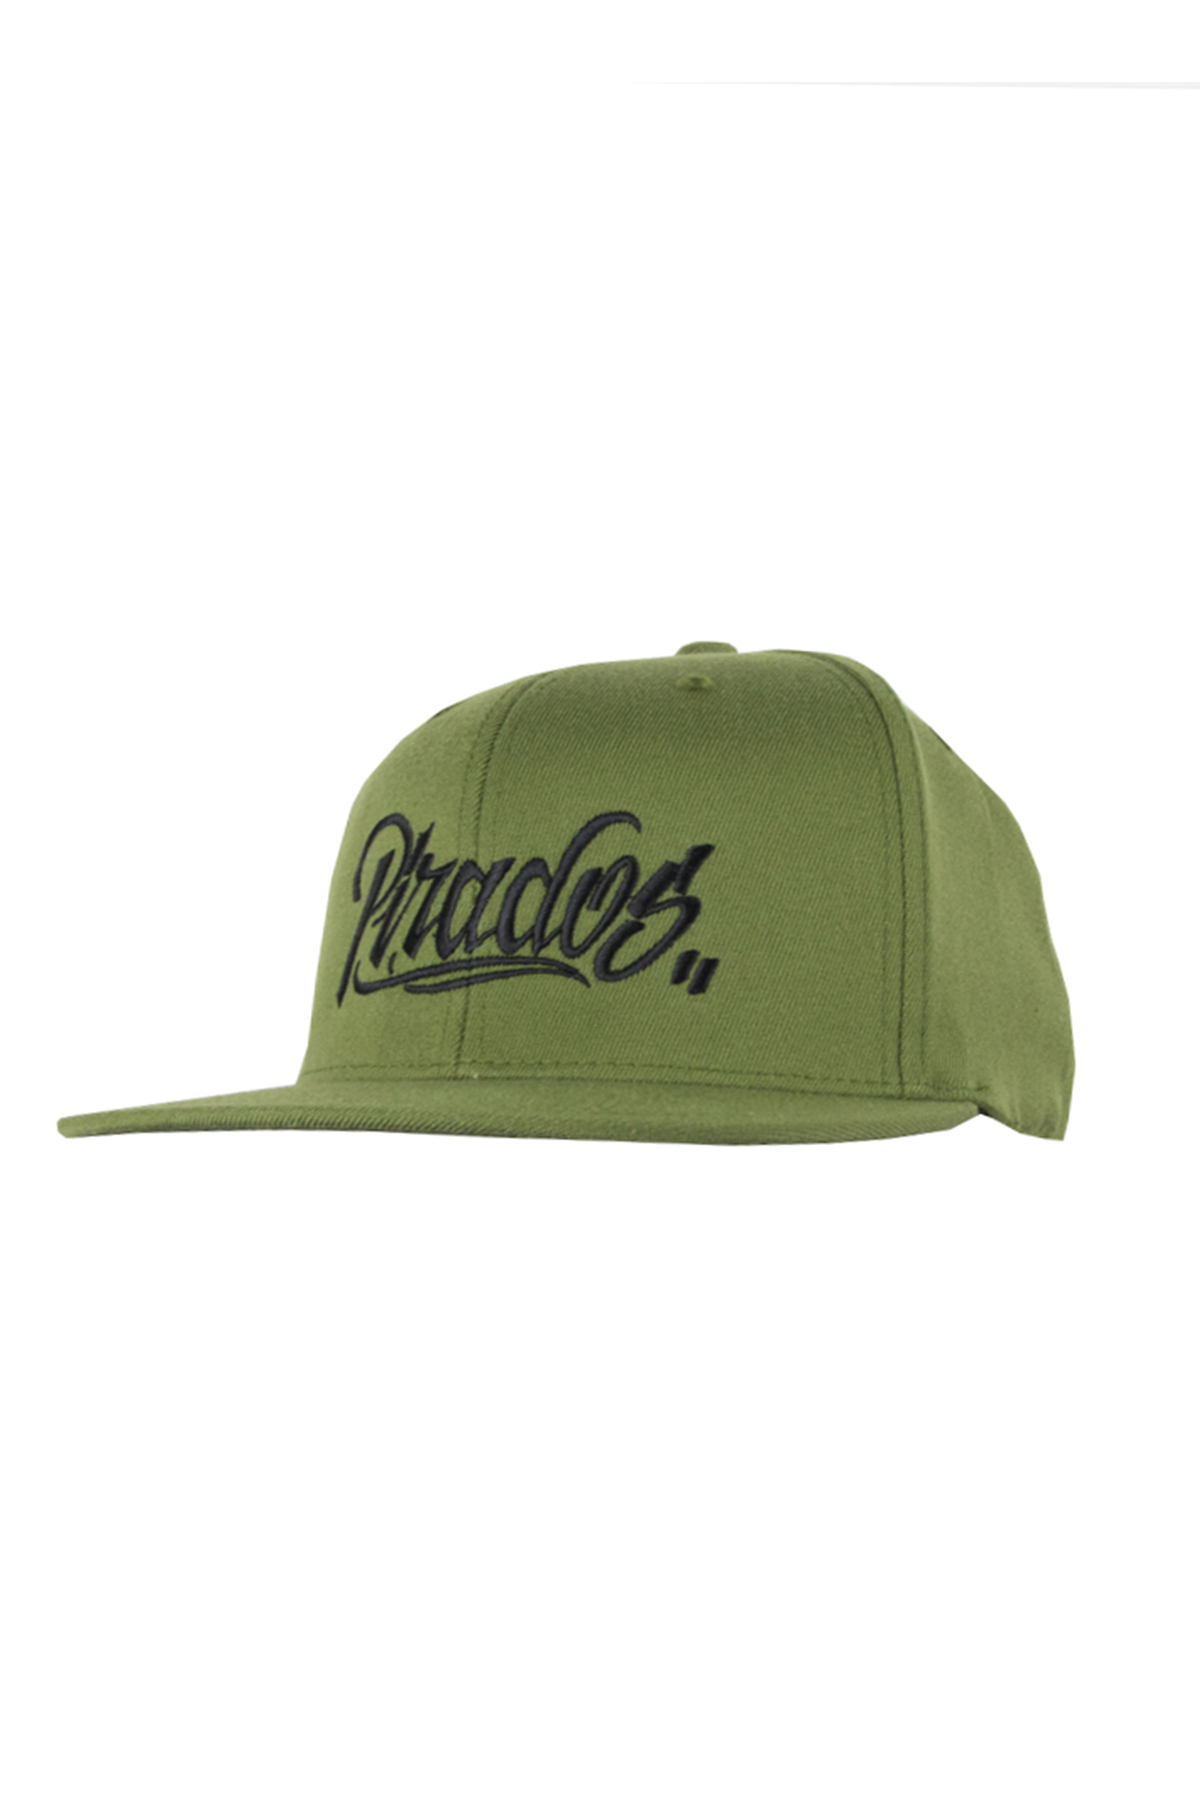 "03feba92d44ba Flexfit Cap ""PIRADOS TM"" Green – PIRADOS"